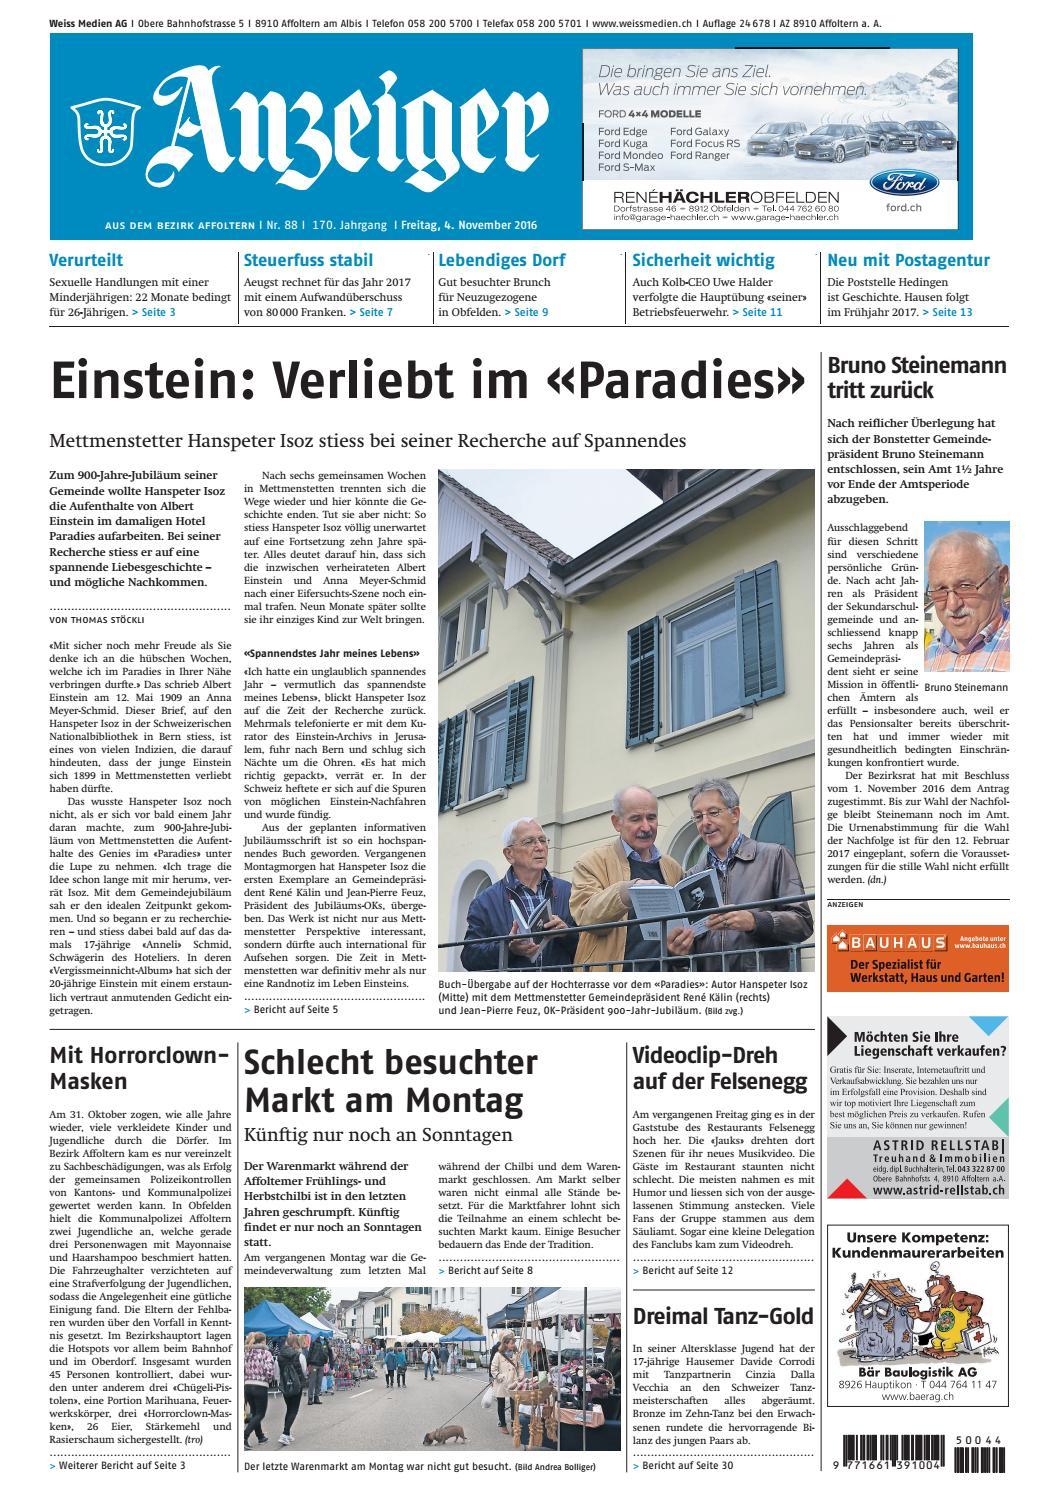 088 2016 by AZ-Anzeiger - issuu